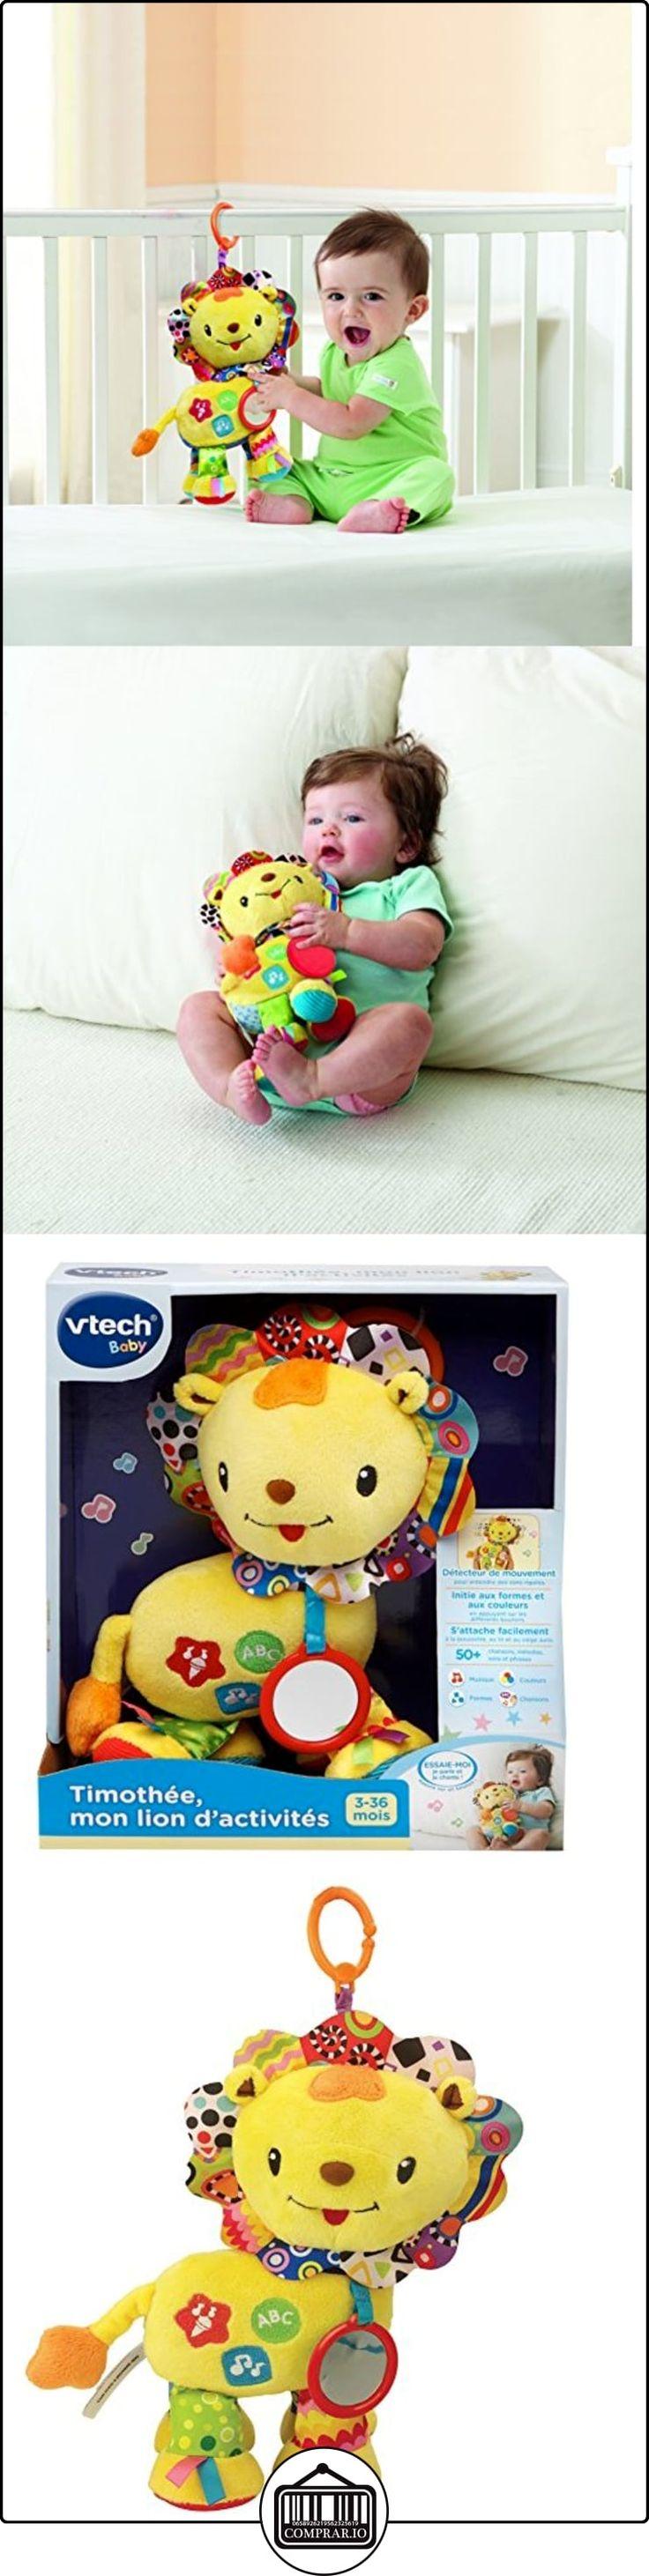 VTech 80-186005 Verde, Naranja, Rojo, Amarillo juguete interactivos - juguetes interactivos (Animal, Lion, Verde, Naranja, Rojo, Amarillo, AAA)  ✿ Regalos para recién nacidos - Bebes ✿ ▬► Ver oferta: http://comprar.io/goto/B016A2MSOC